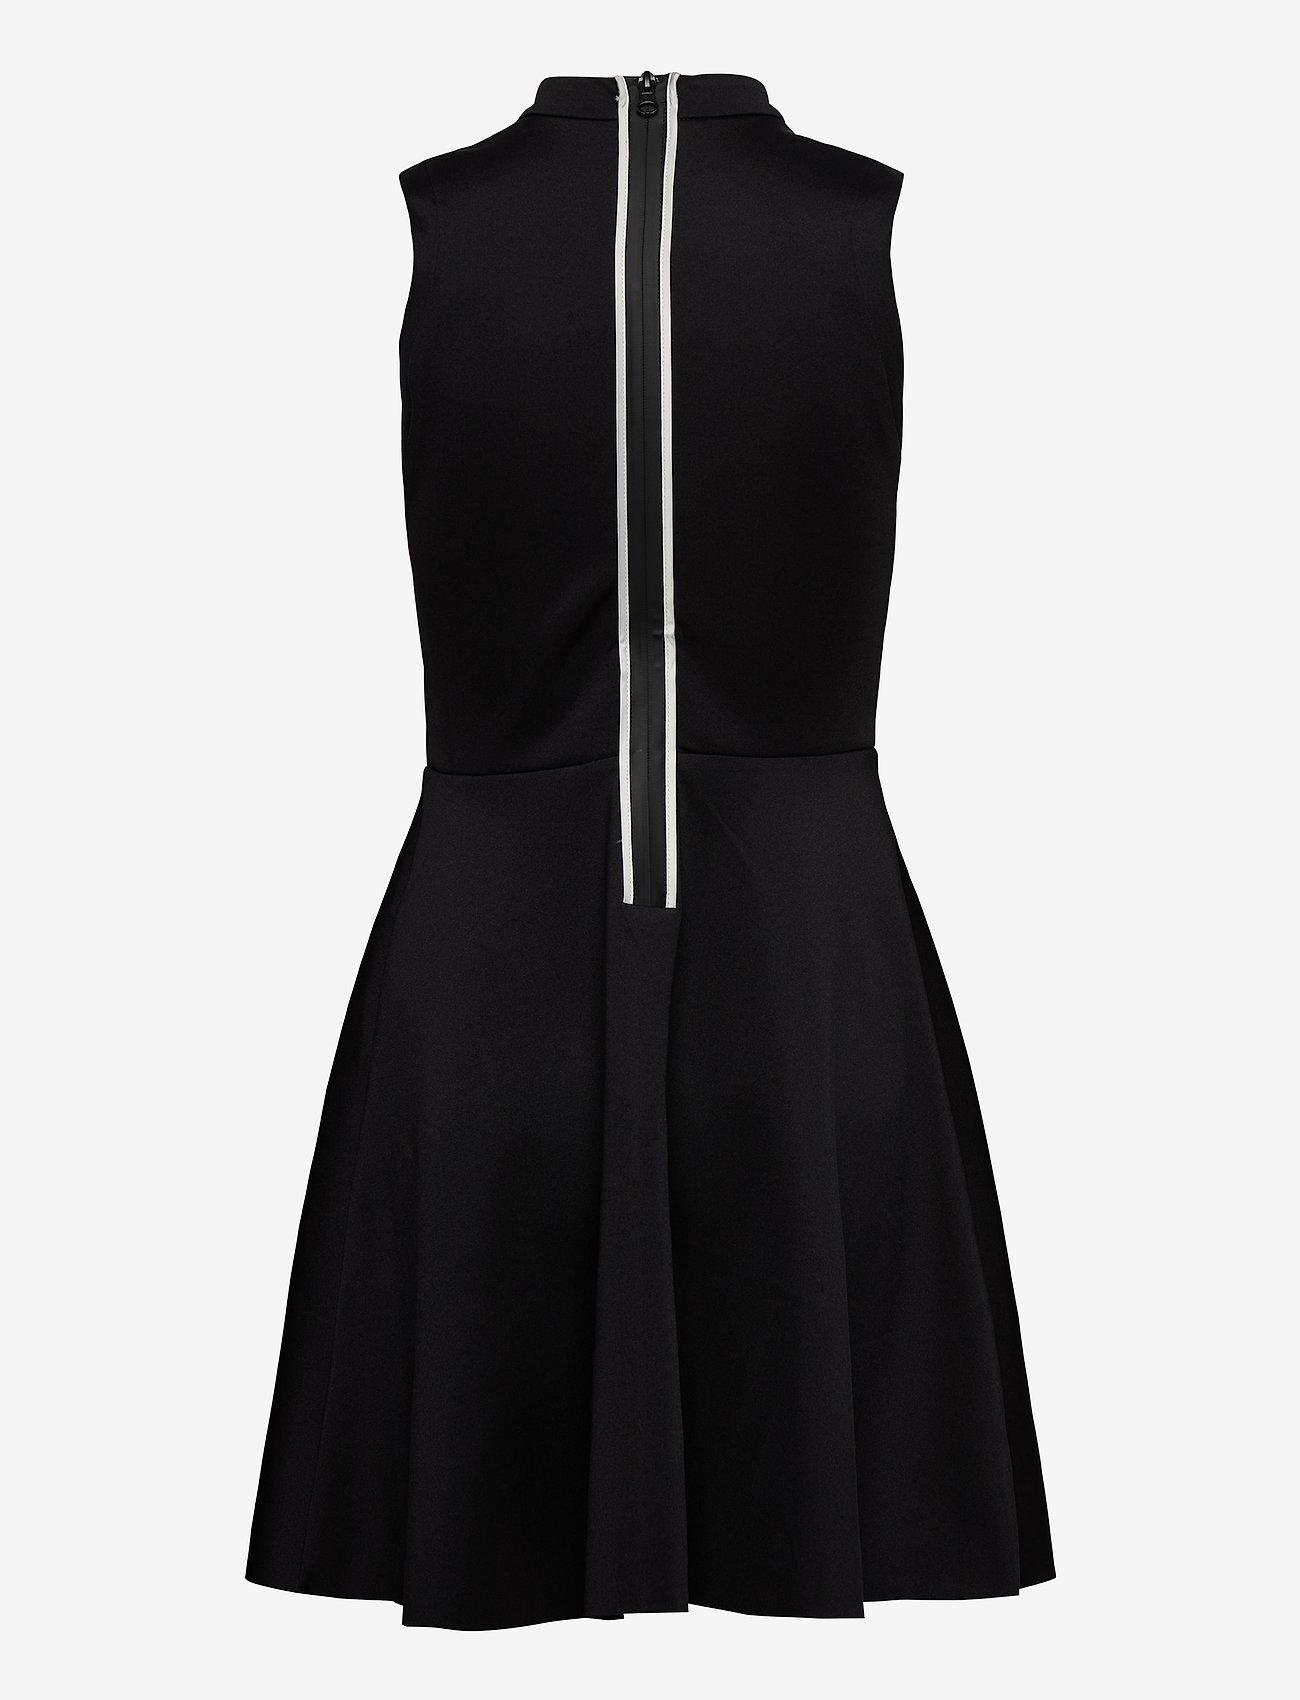 GUESS Jeans ENDORA DRESS - Kjoler JET BLACK A996 - Dameklær Spesialtilbud